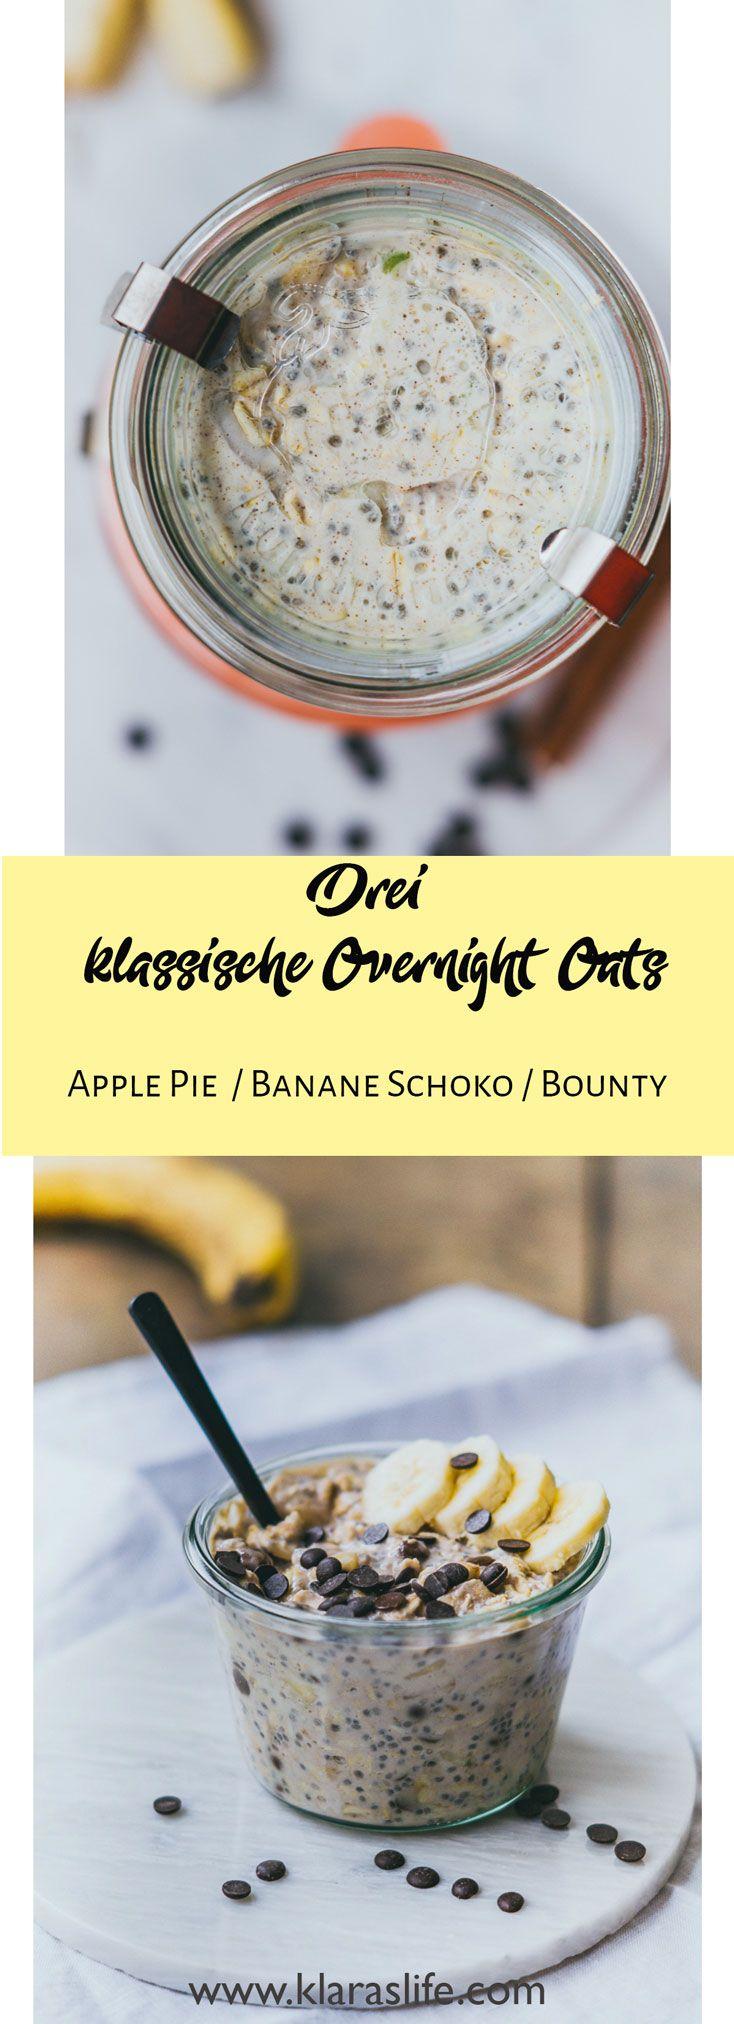 3 Klassische Overnight Oat Rezepte. - Klara`s Life